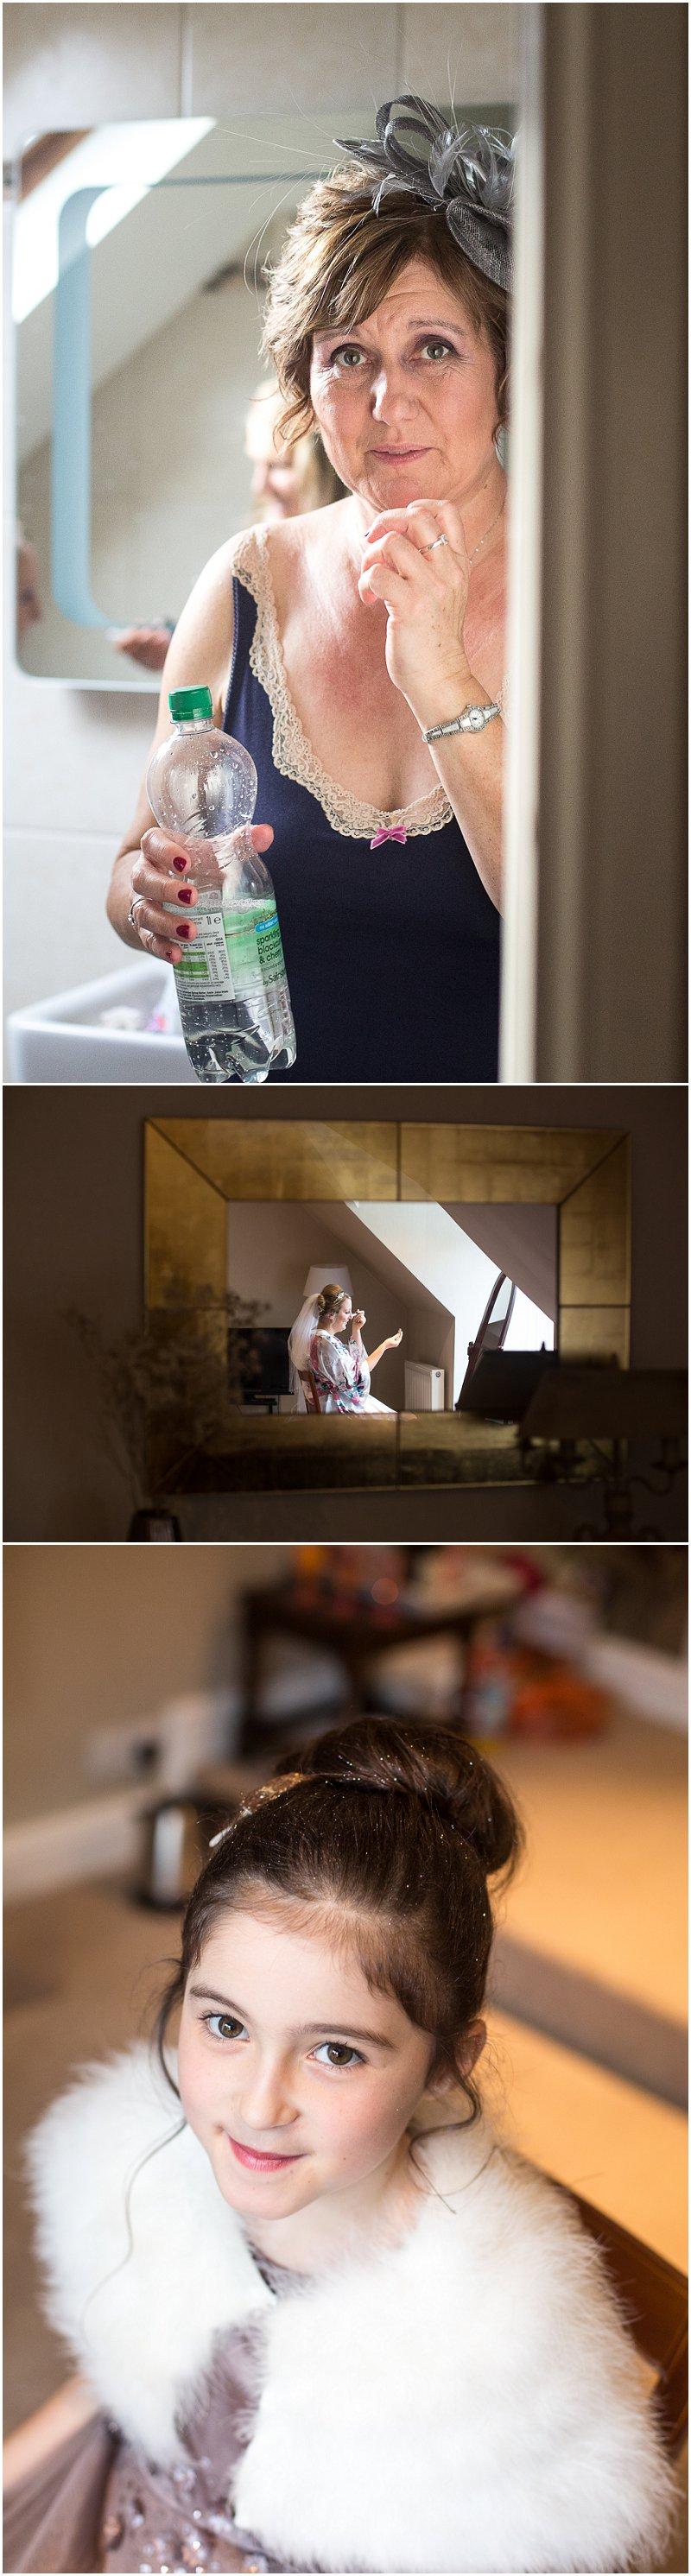 Cumbria Wedding Photography | Wordsworth Hotel Wedding Photography